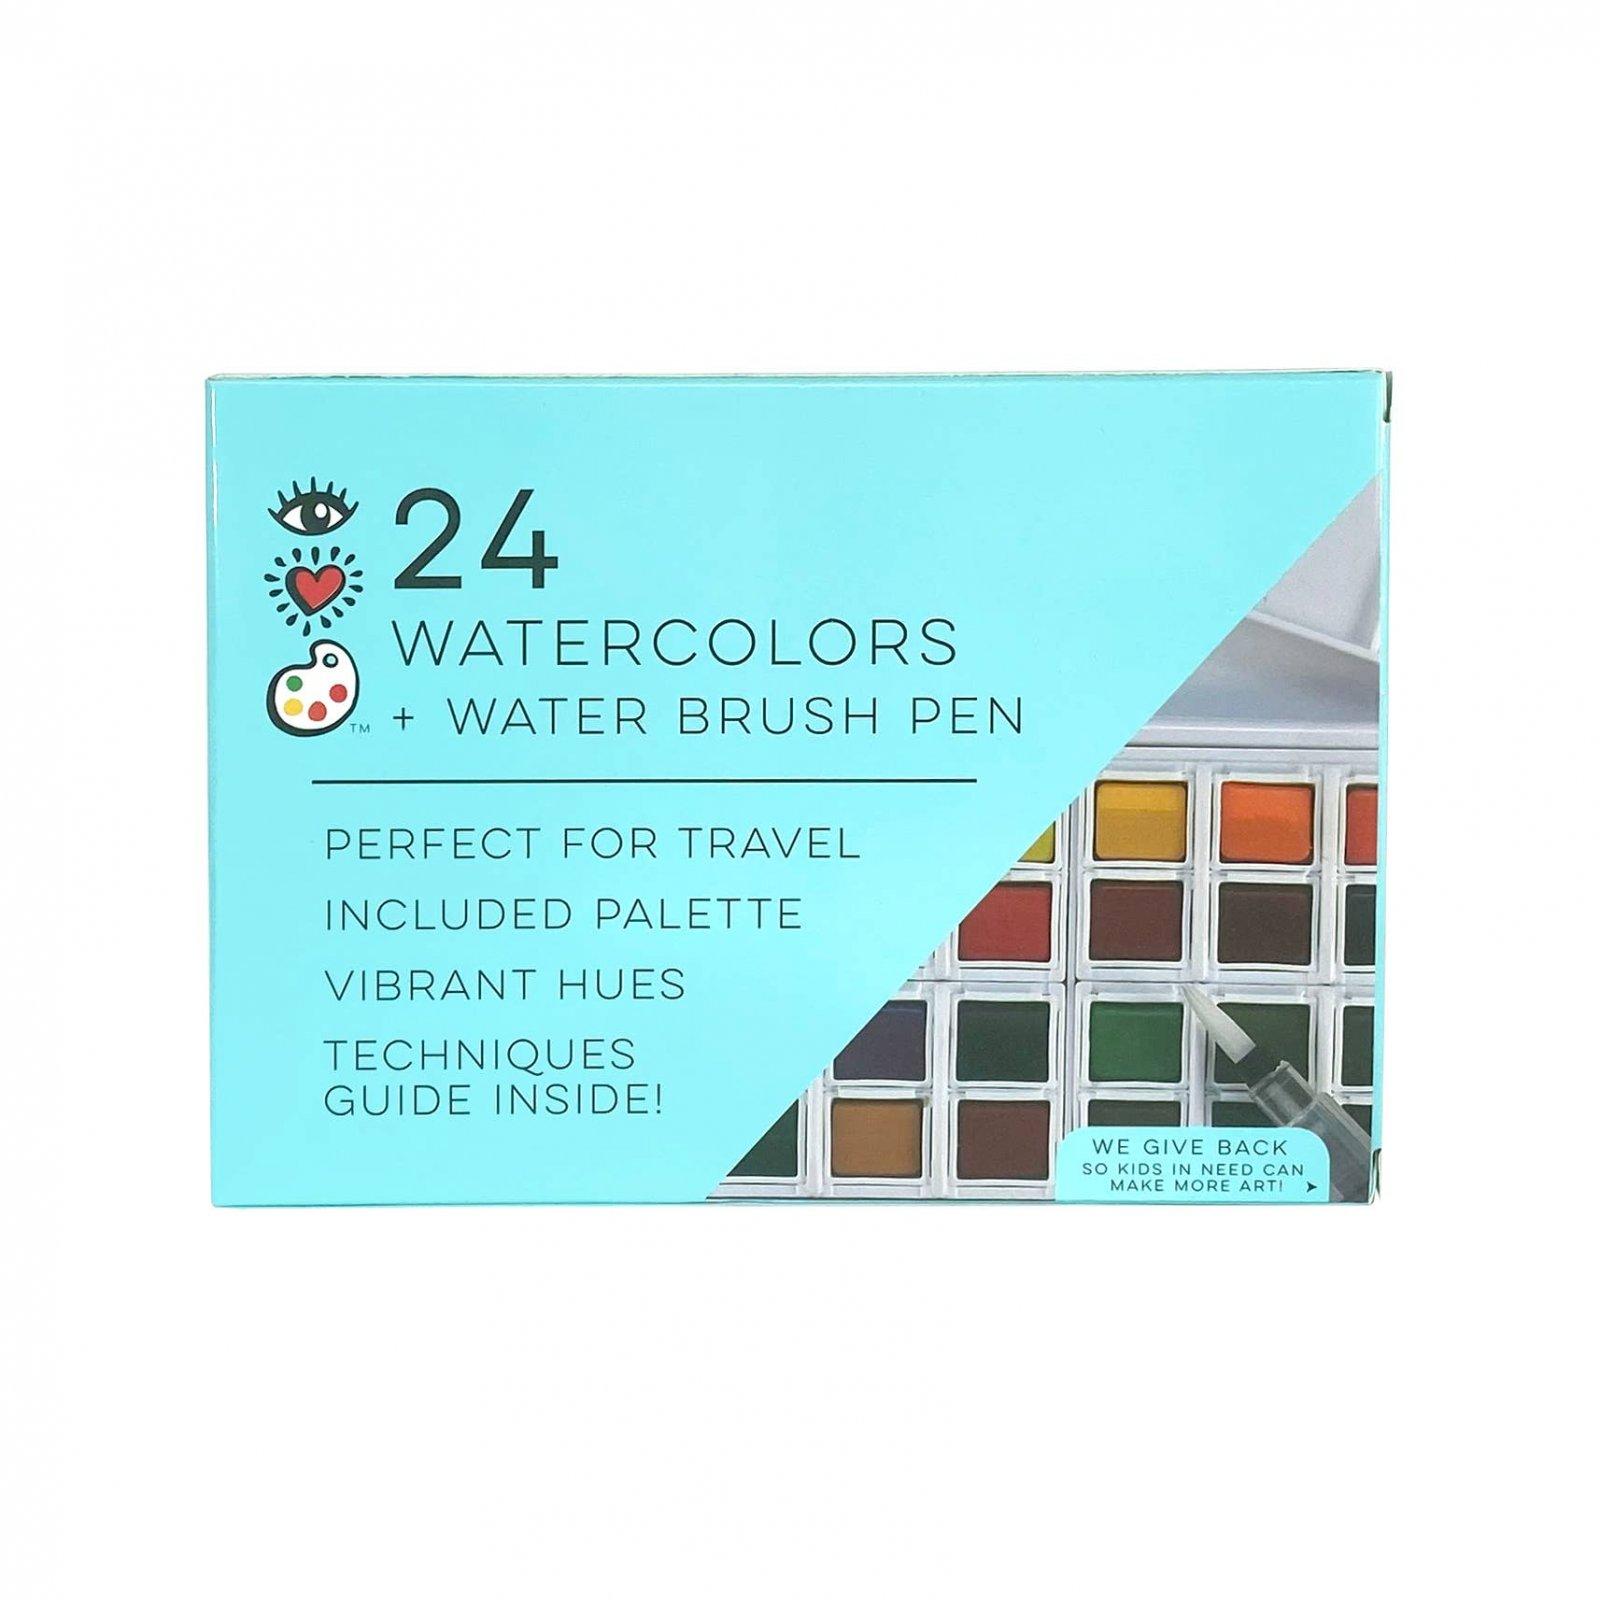 24 Watercolors + Water Brush Pen by I Heart Art